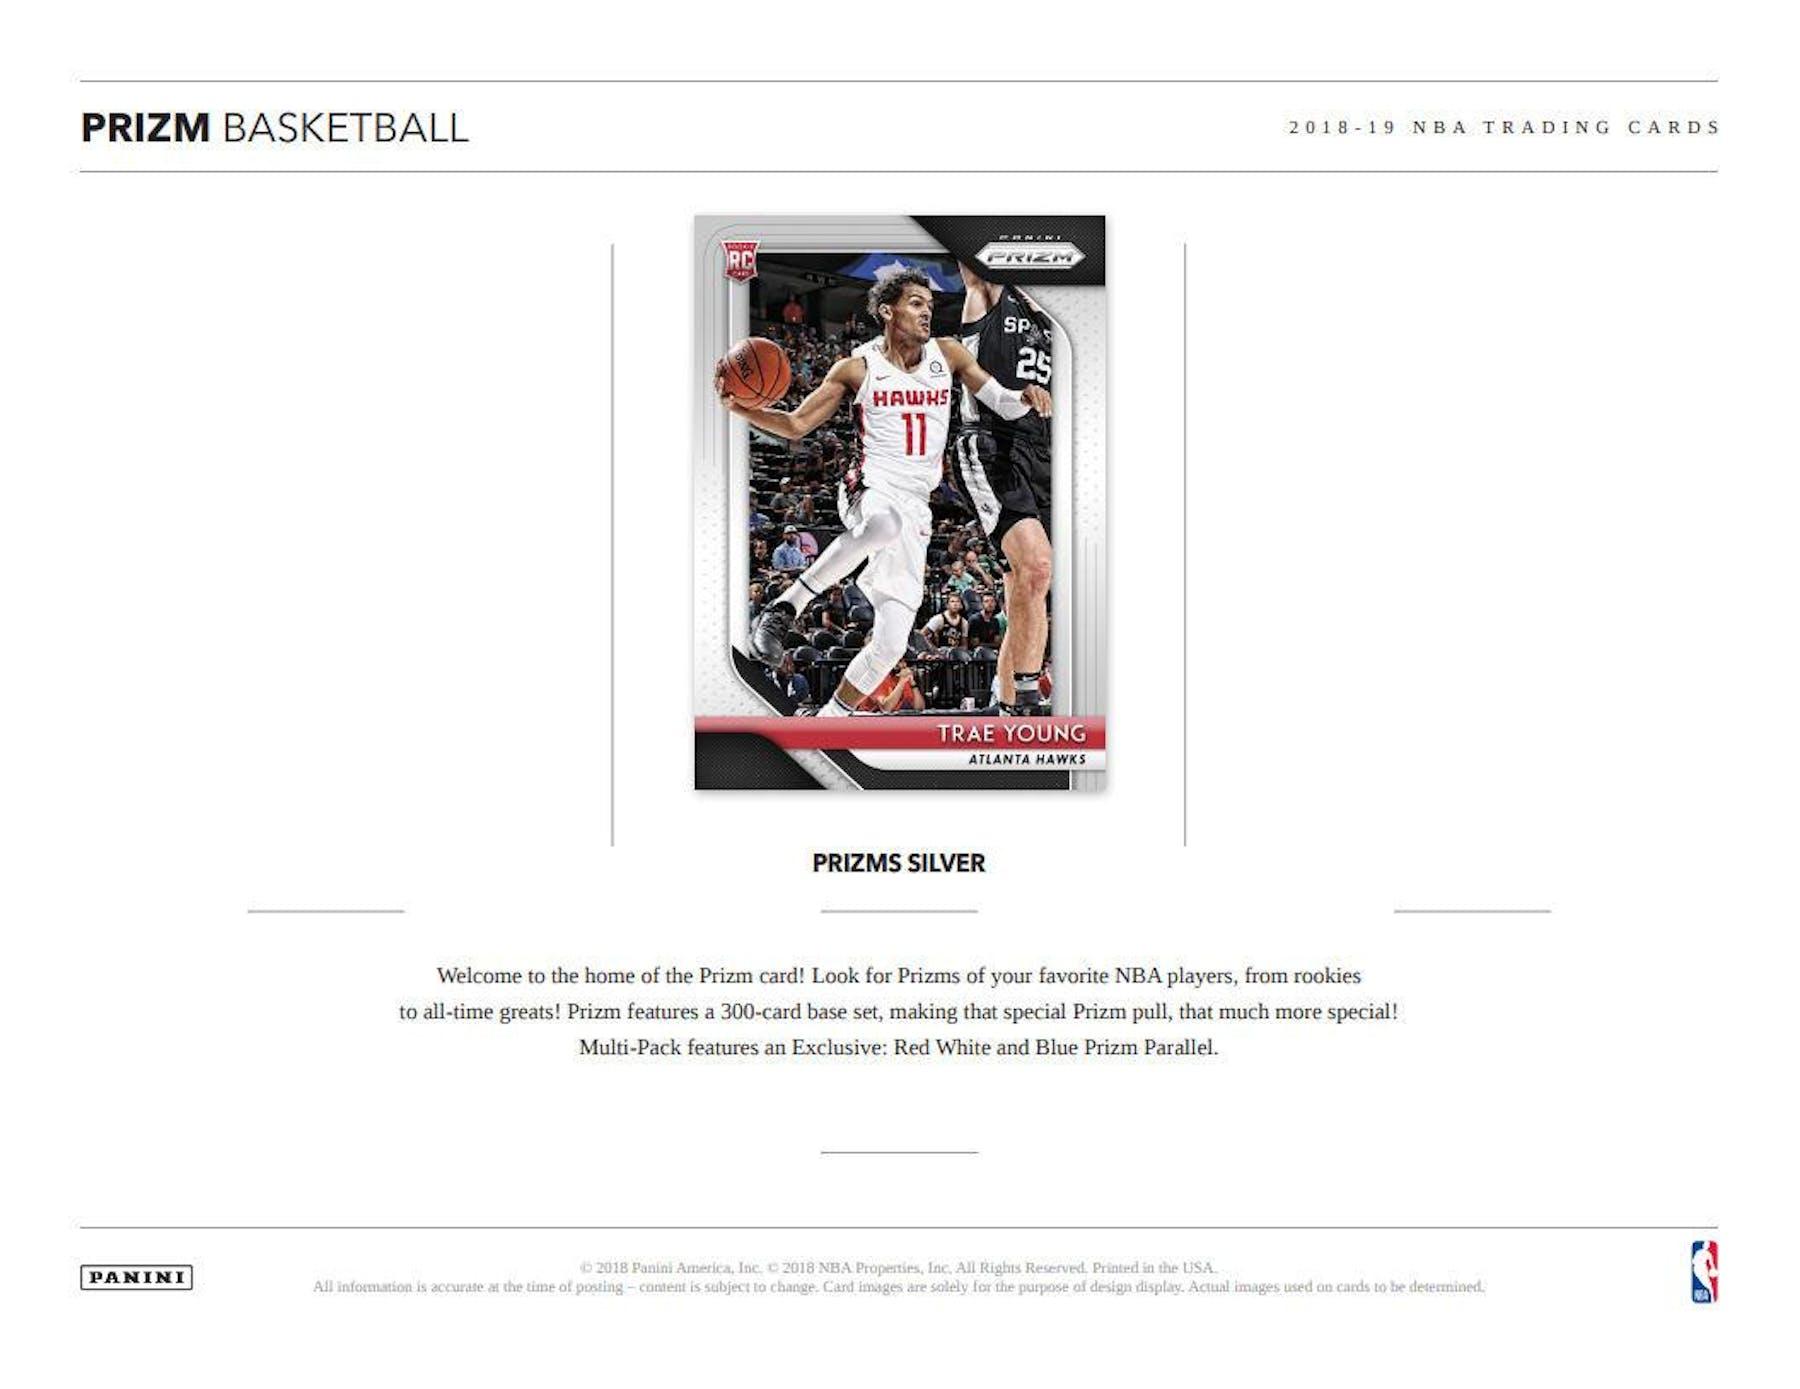 2018/19 Panini Prizm Basketball Super Value Rack Box | DA